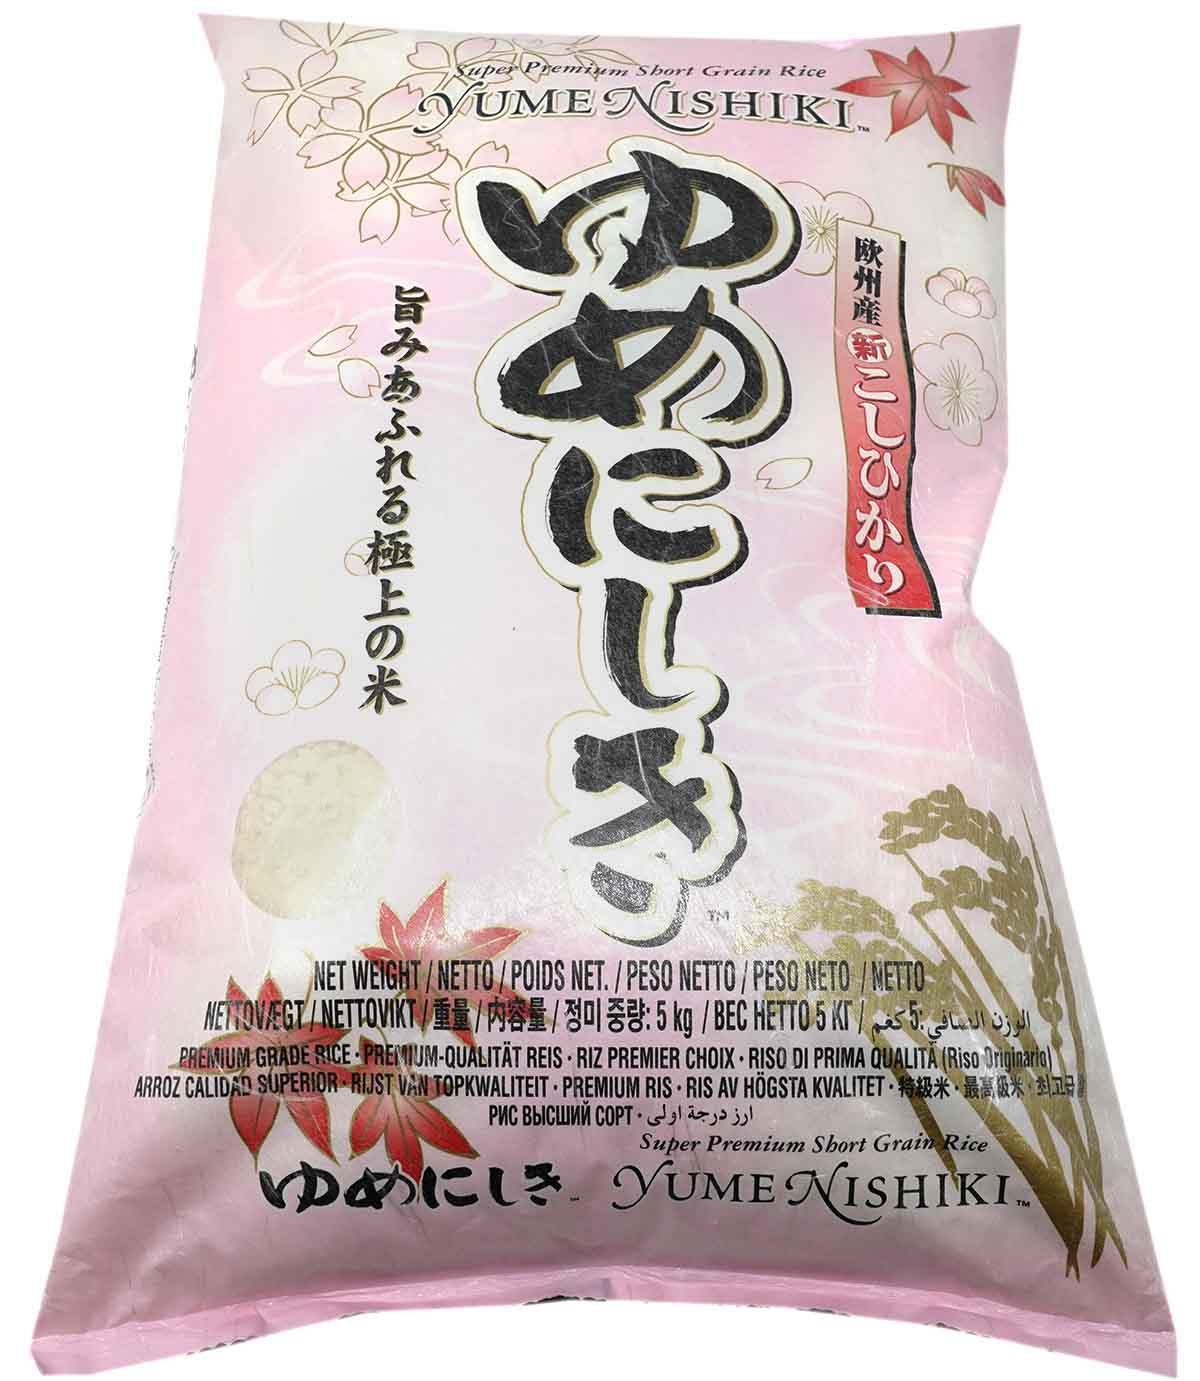 Yume Nishiki japanischer Premium Reis, 5 kg